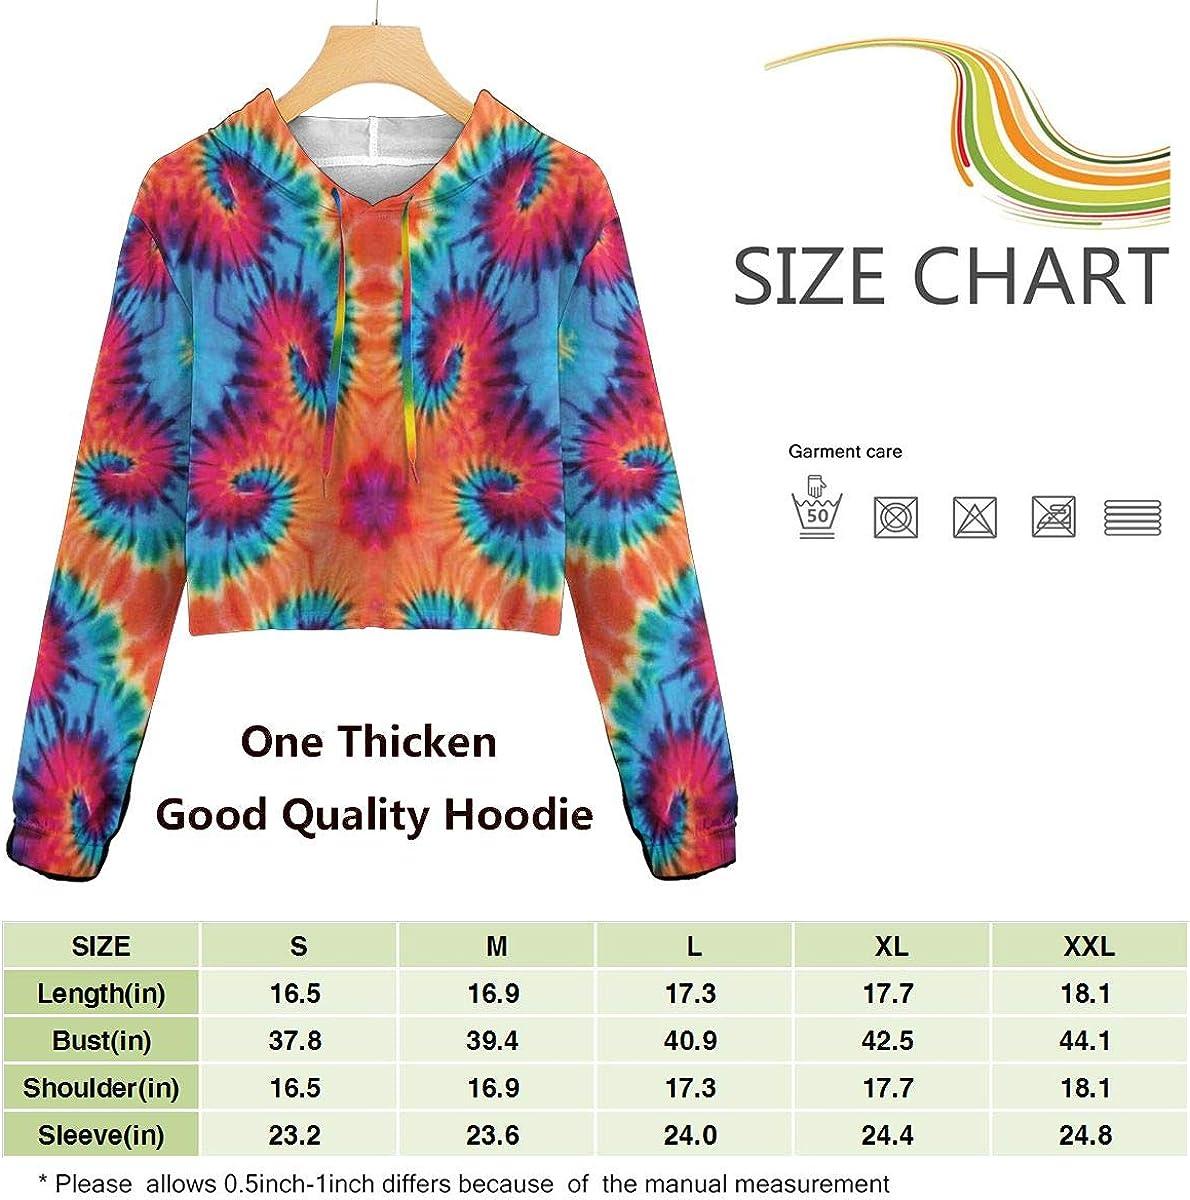 VANMASS Girls Sweater Tie Dye Decor Cropped Hoodies Pullover Sweatshirts Gifts